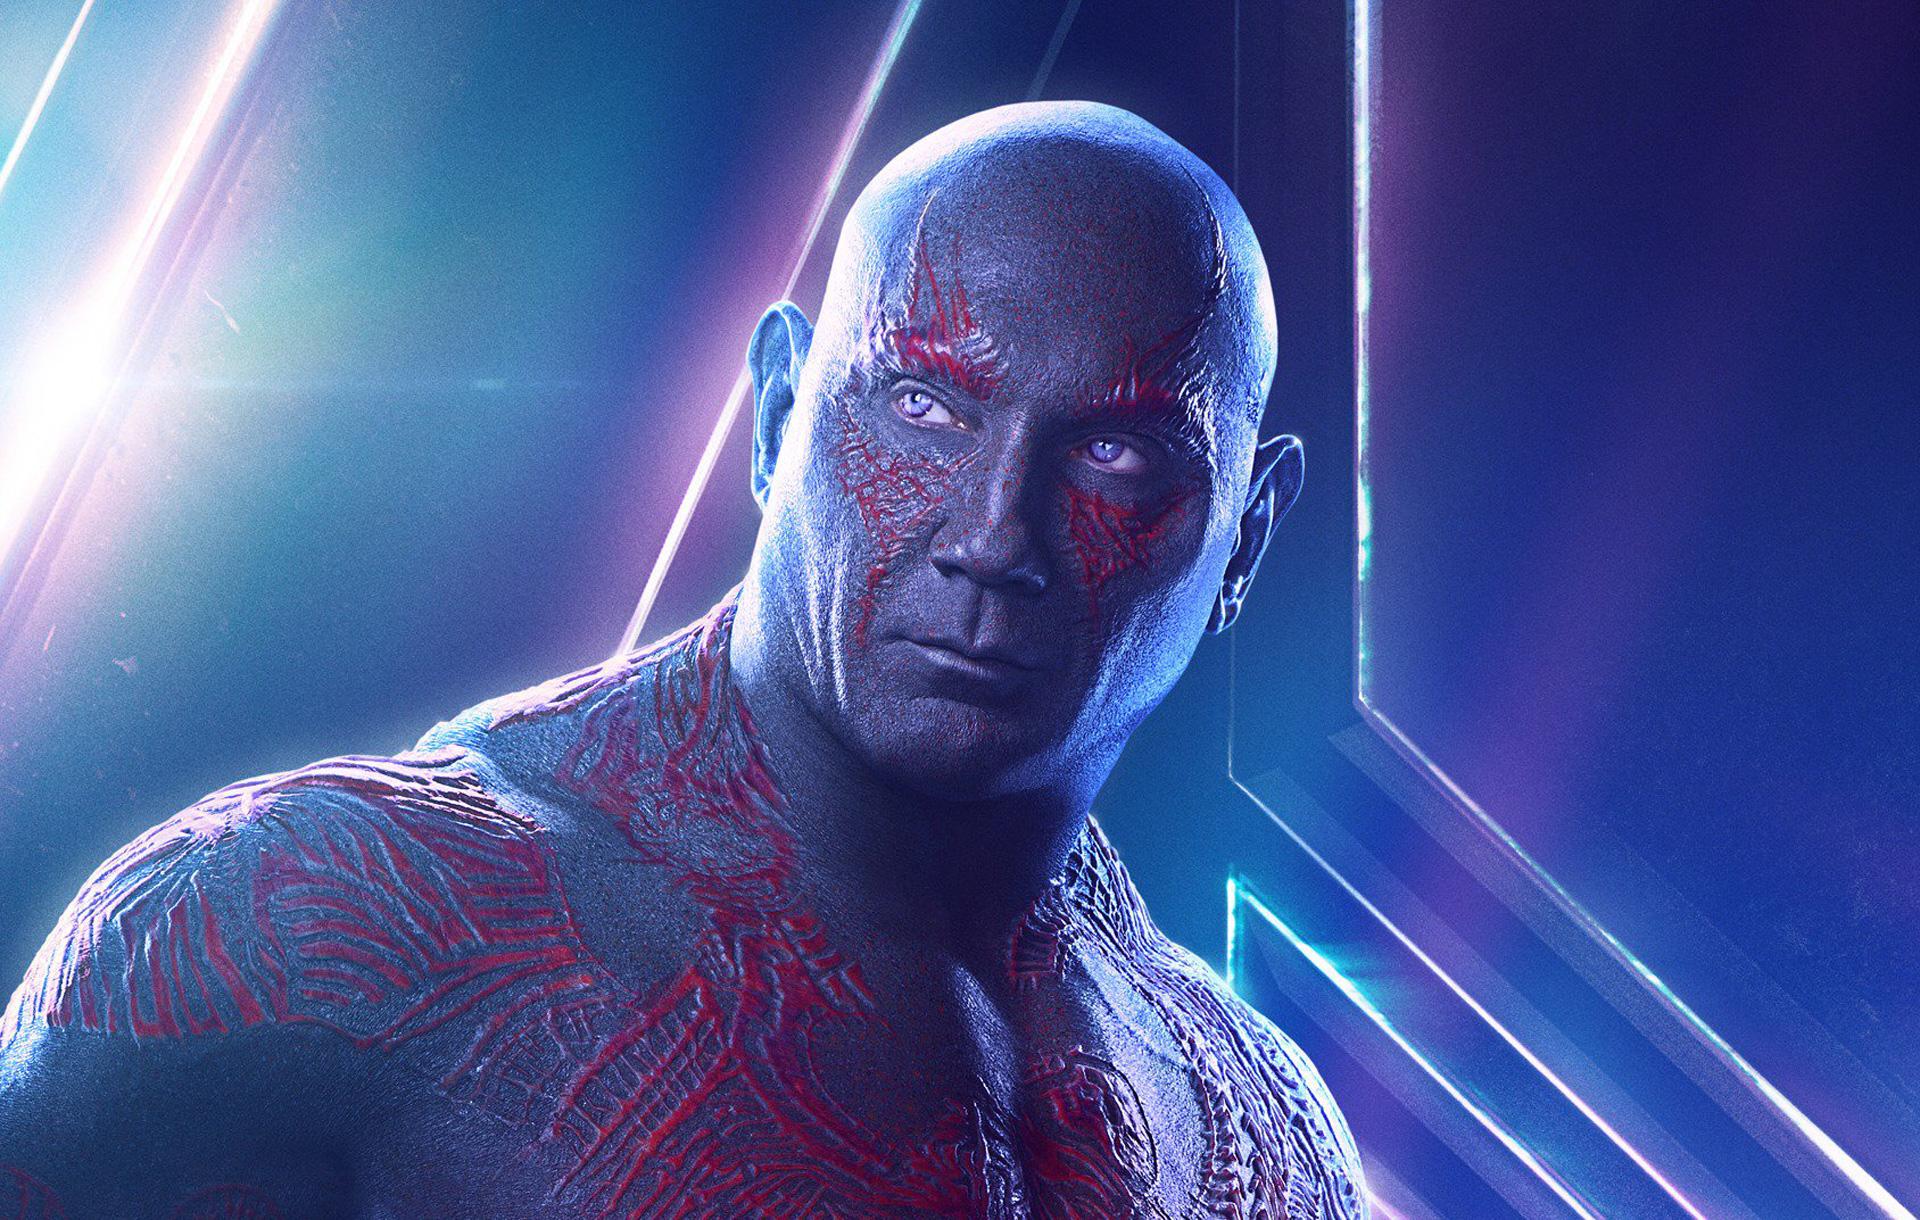 Shuri In Avengers Infinity War New Poster Hd Movies 4k: Drax In Avengers Infinity War New Poster, HD Movies, 4k